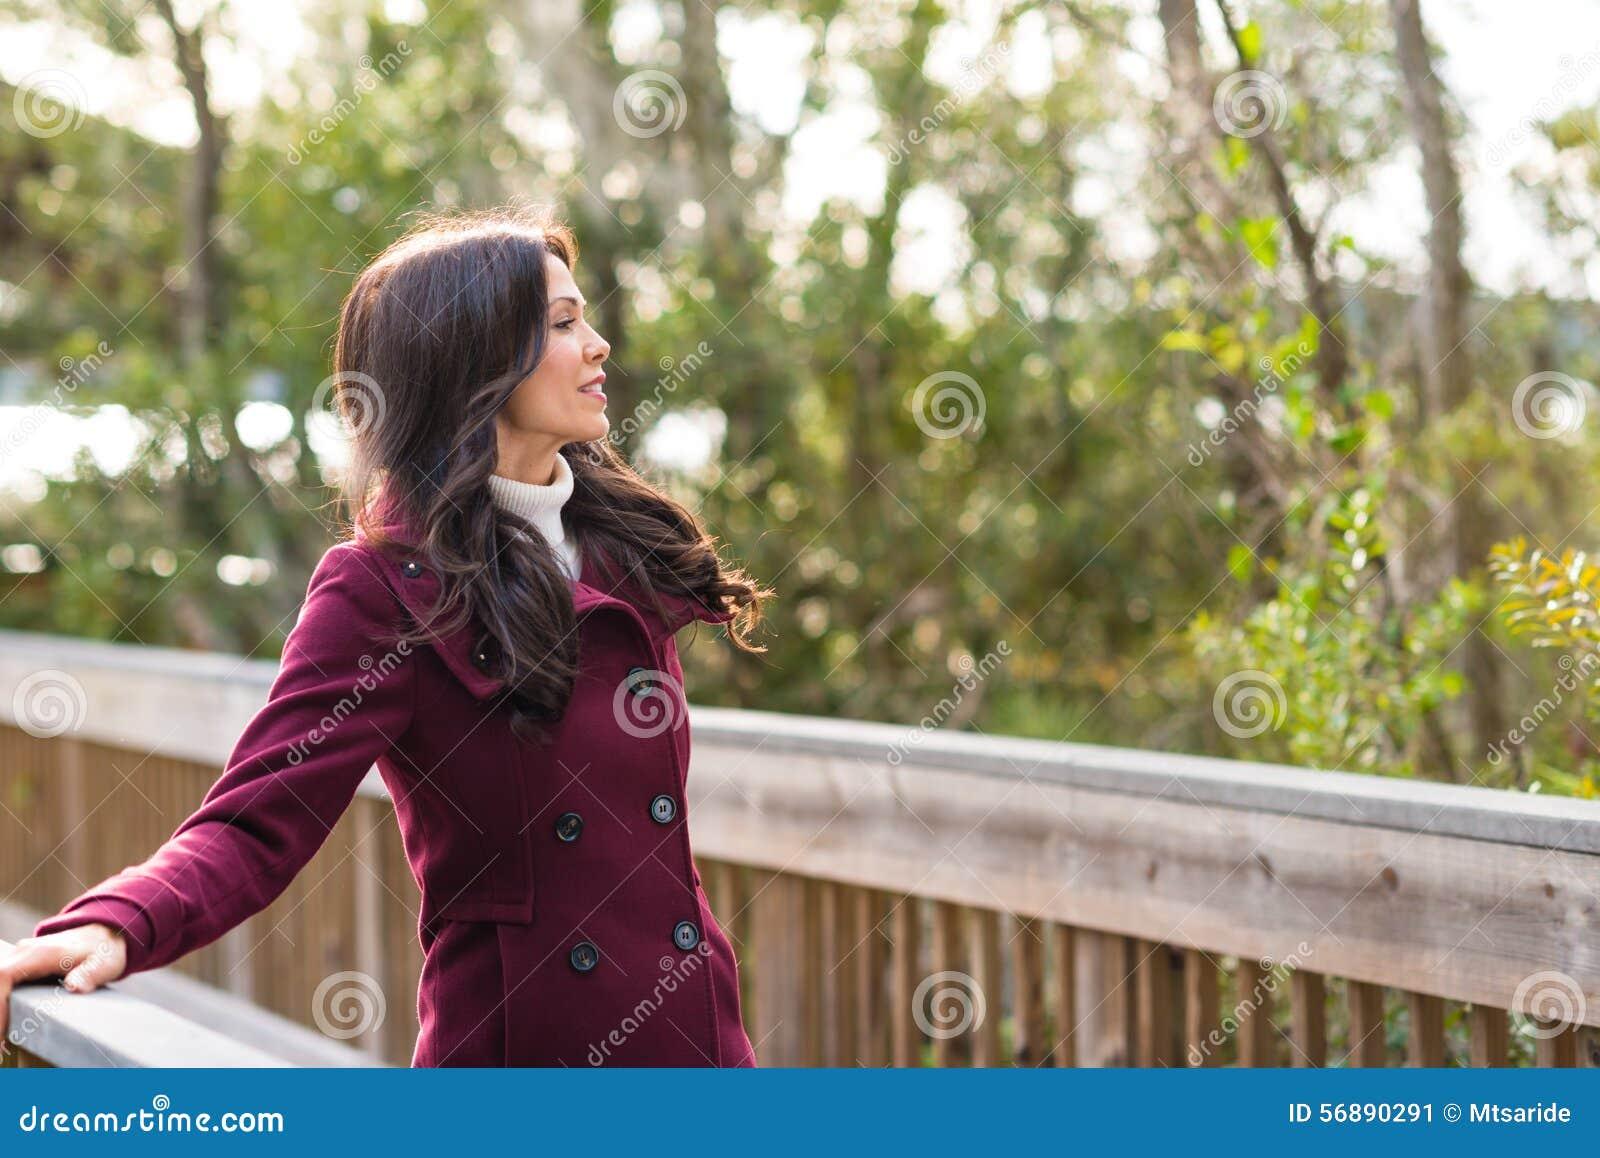 Giovane donna nell ambiente naturale